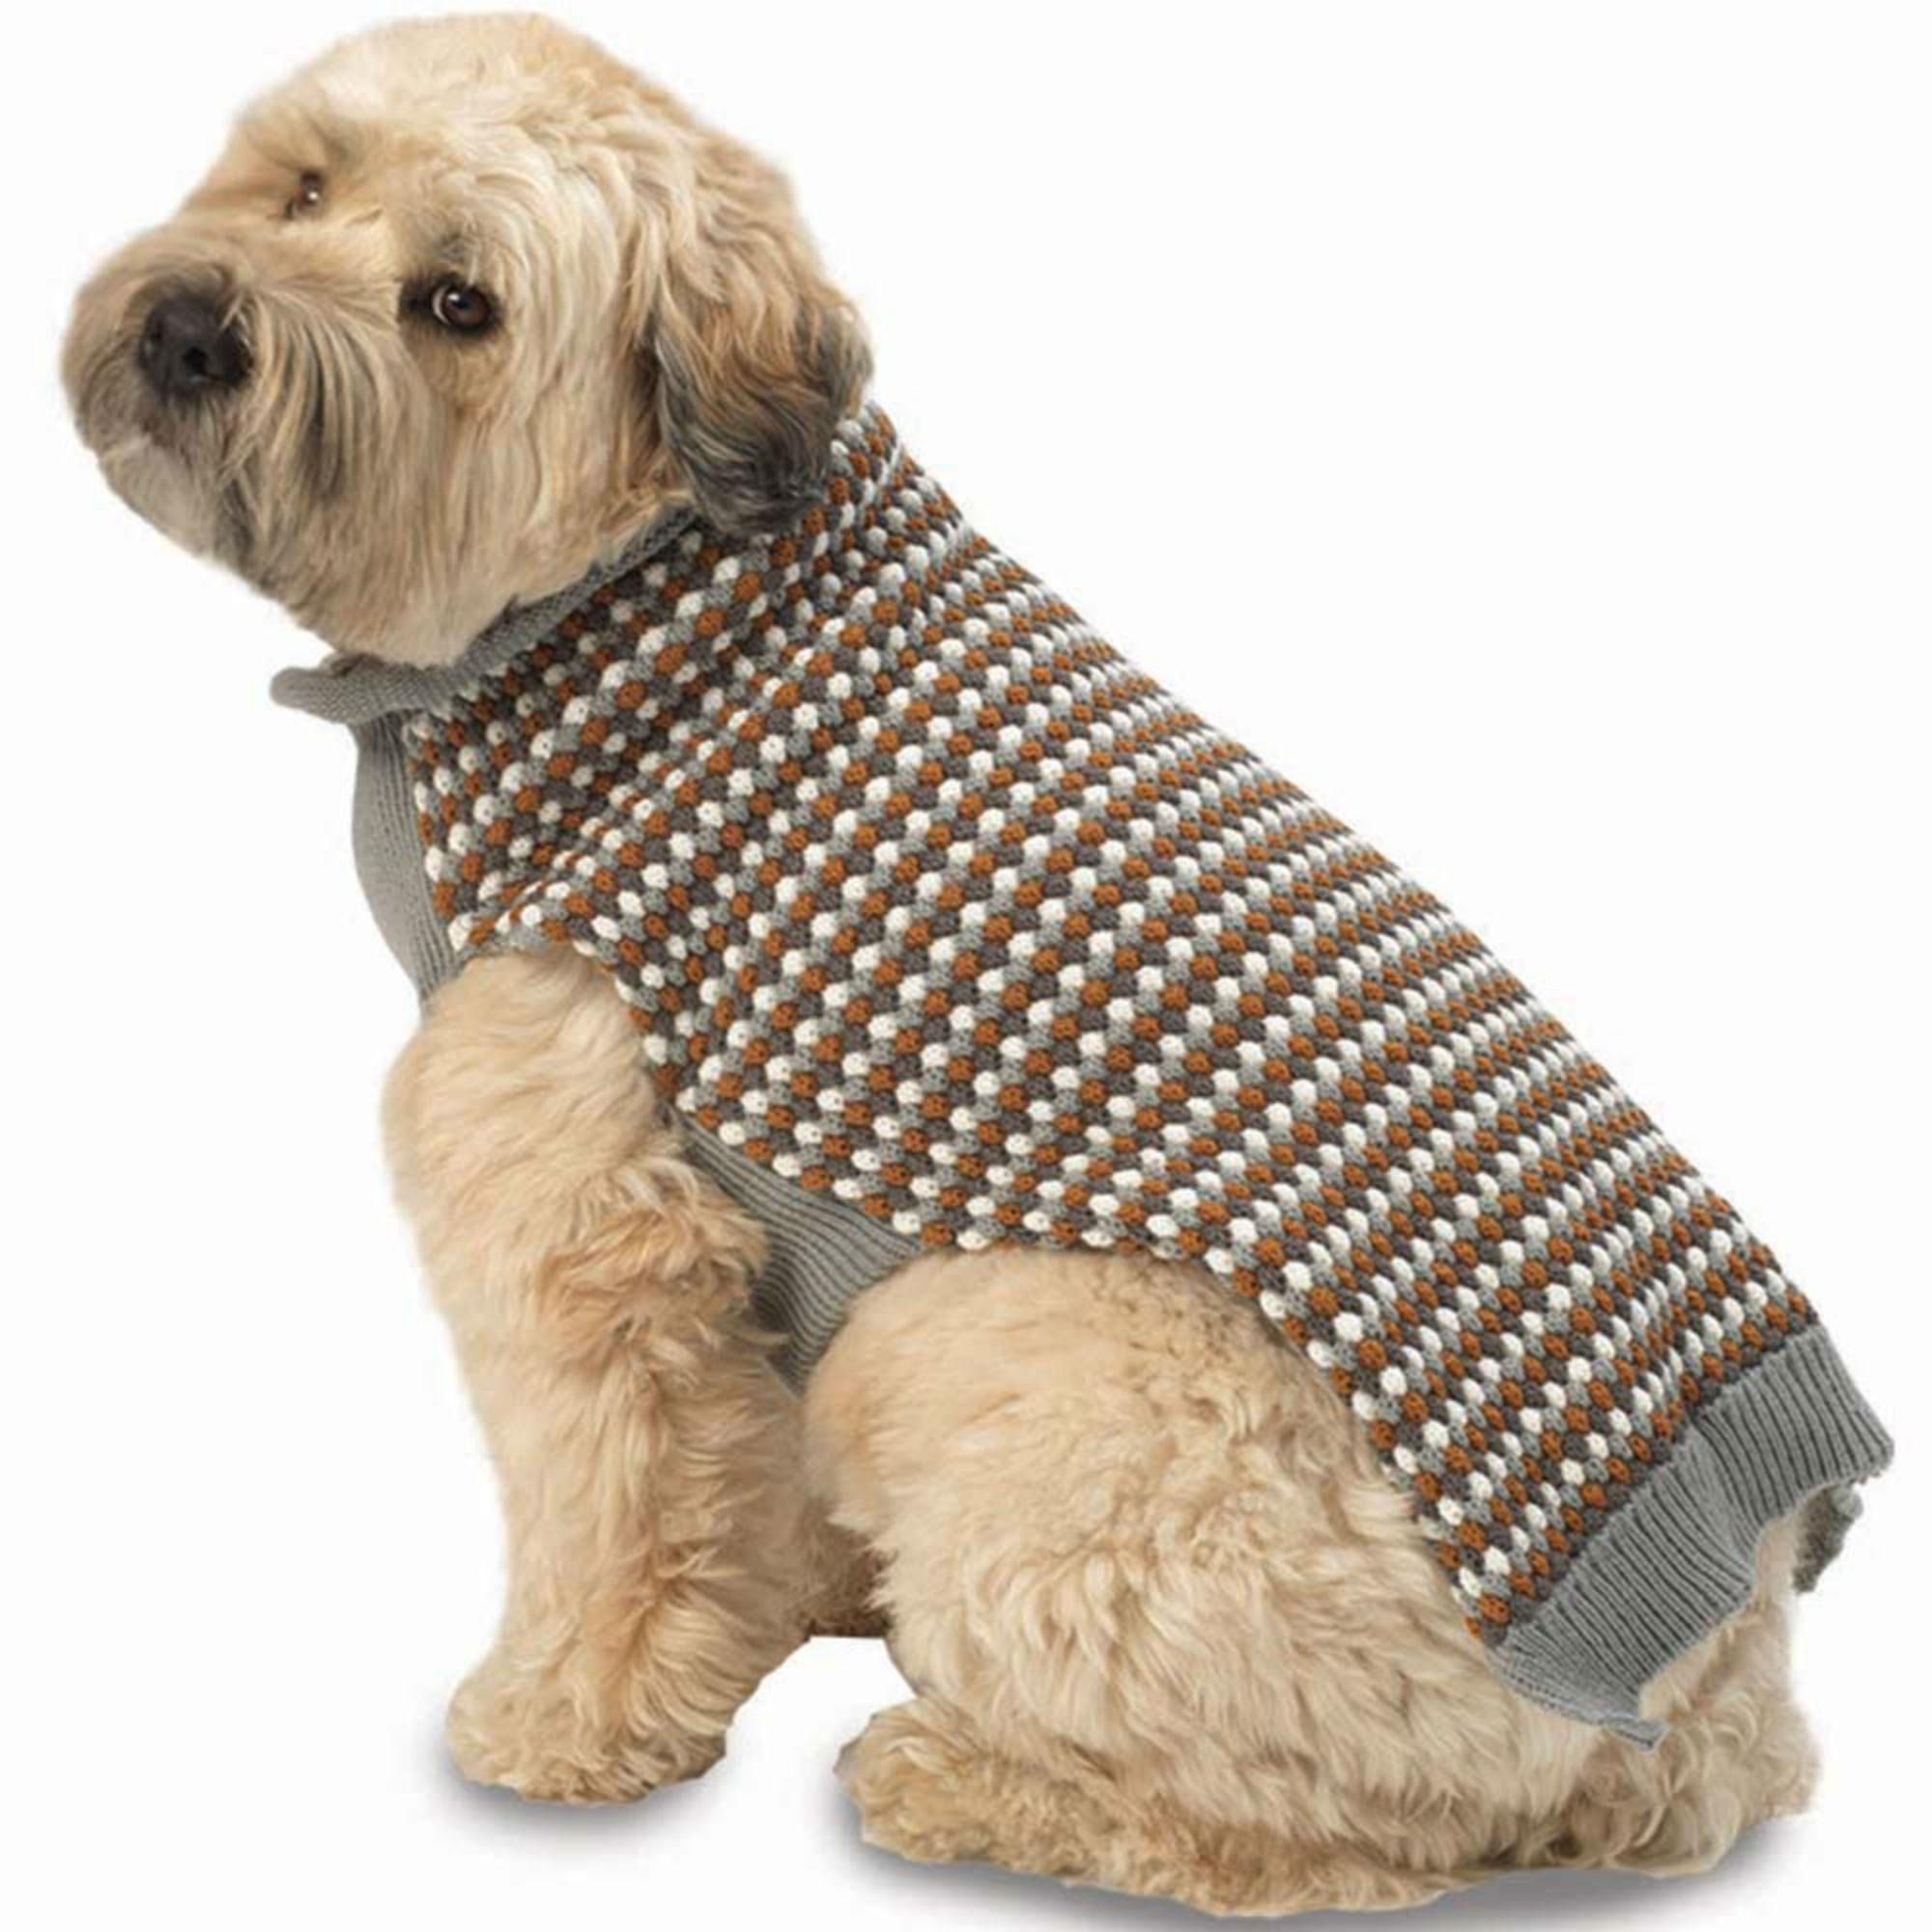 Popper's Dog Sweater - Gray Multi